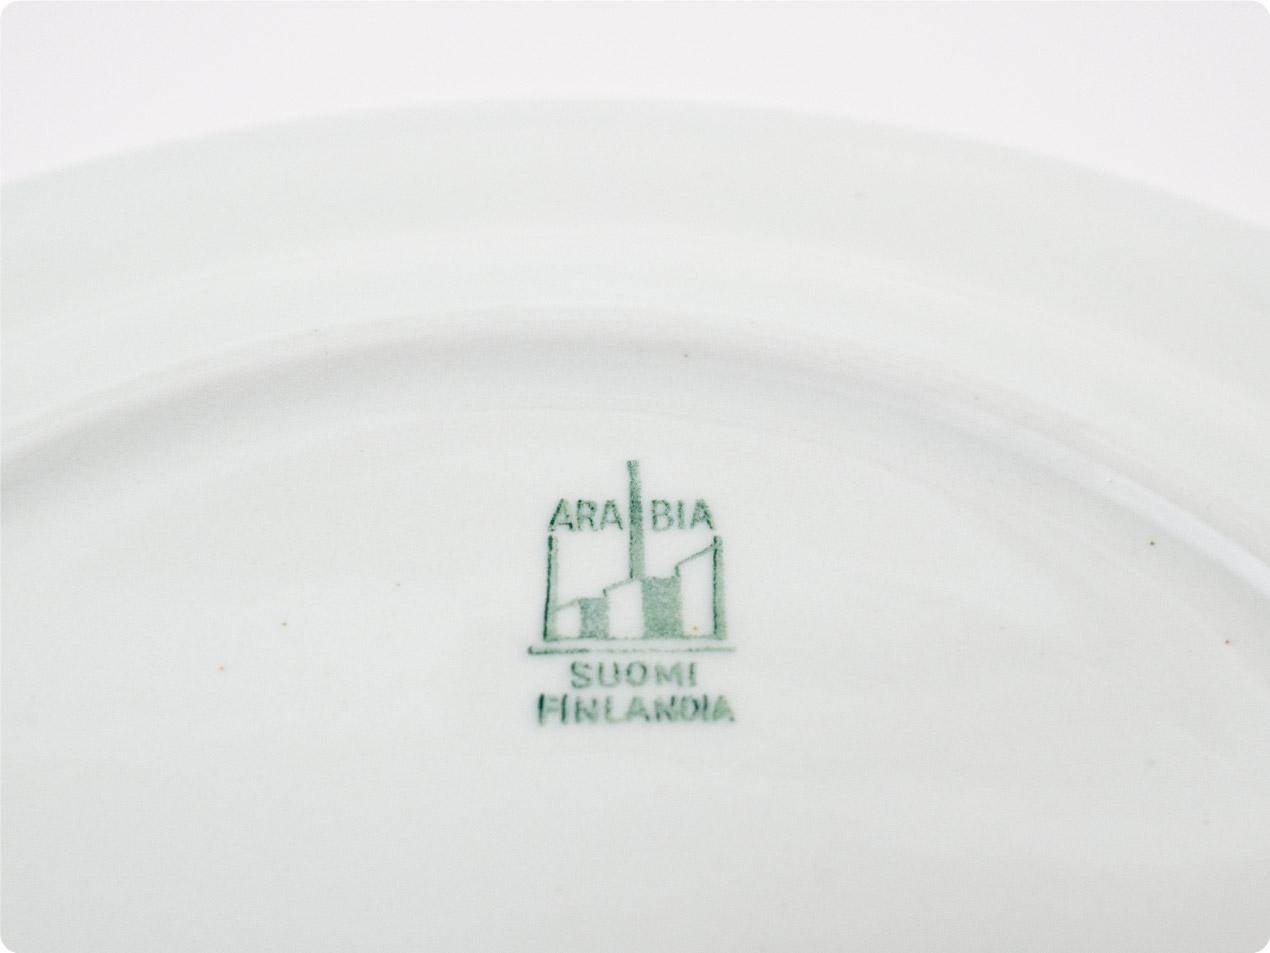 ARABIA プレート ライトグレー